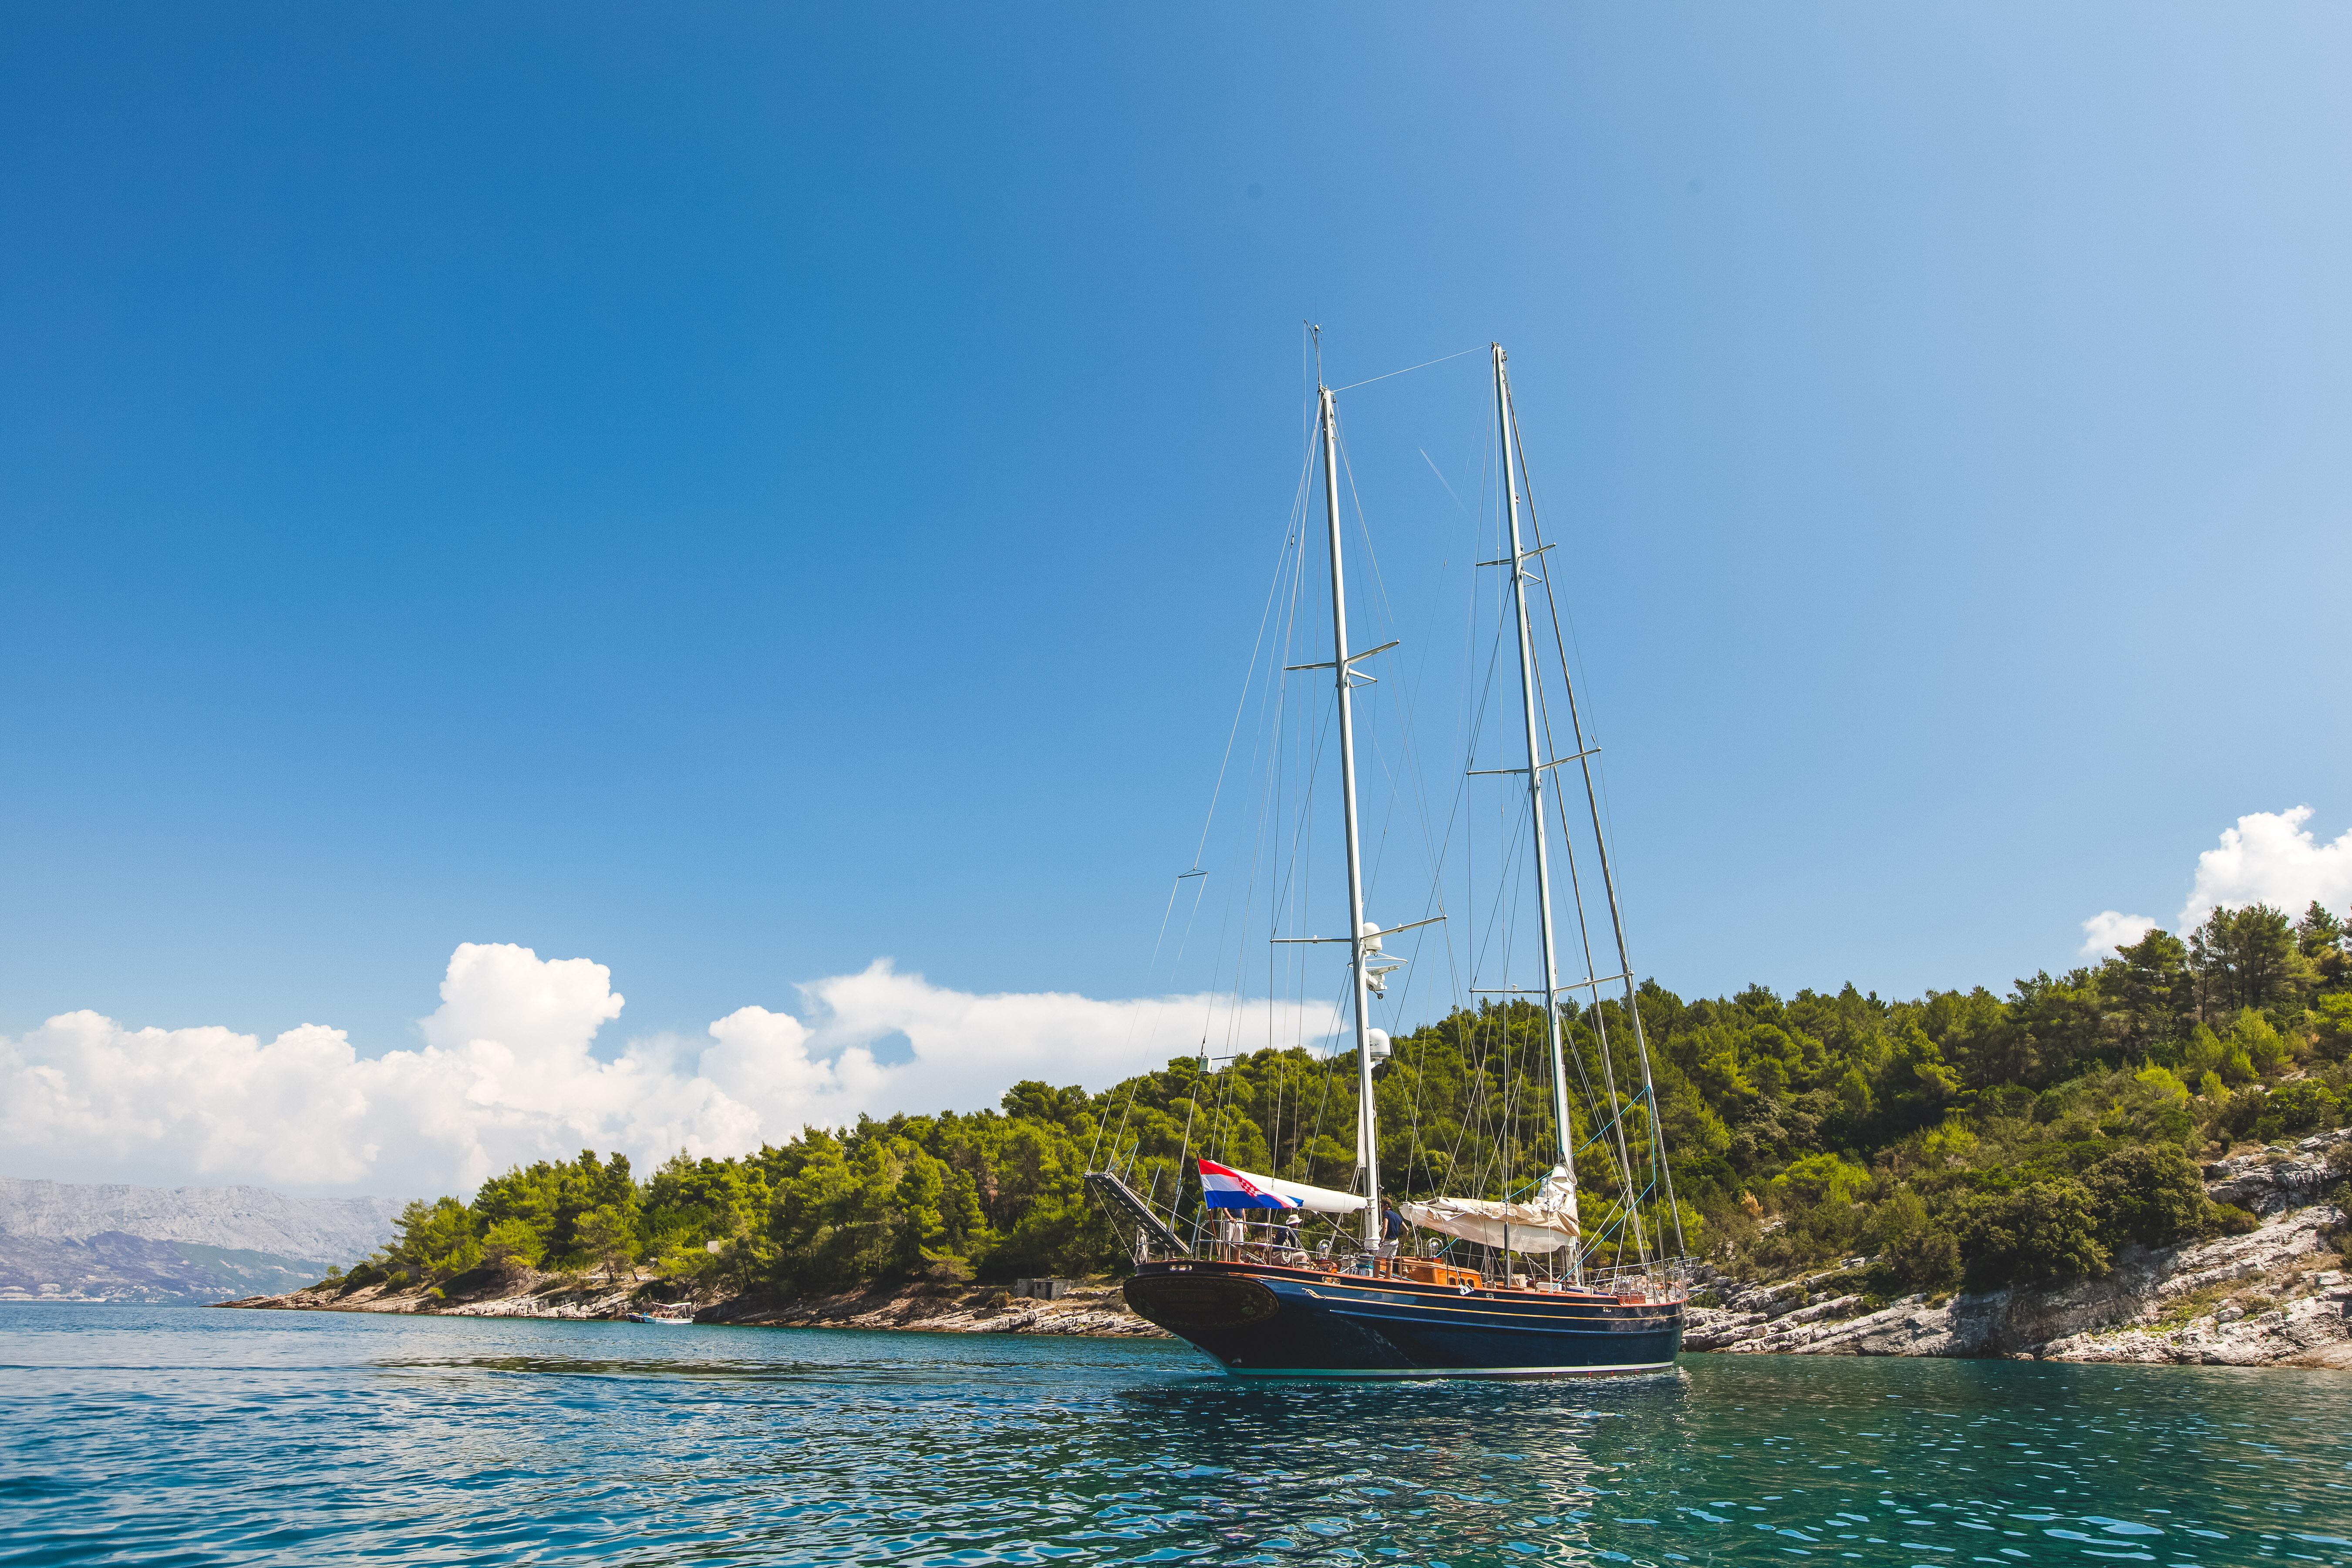 Sailing Yacht Lauran - Croatia